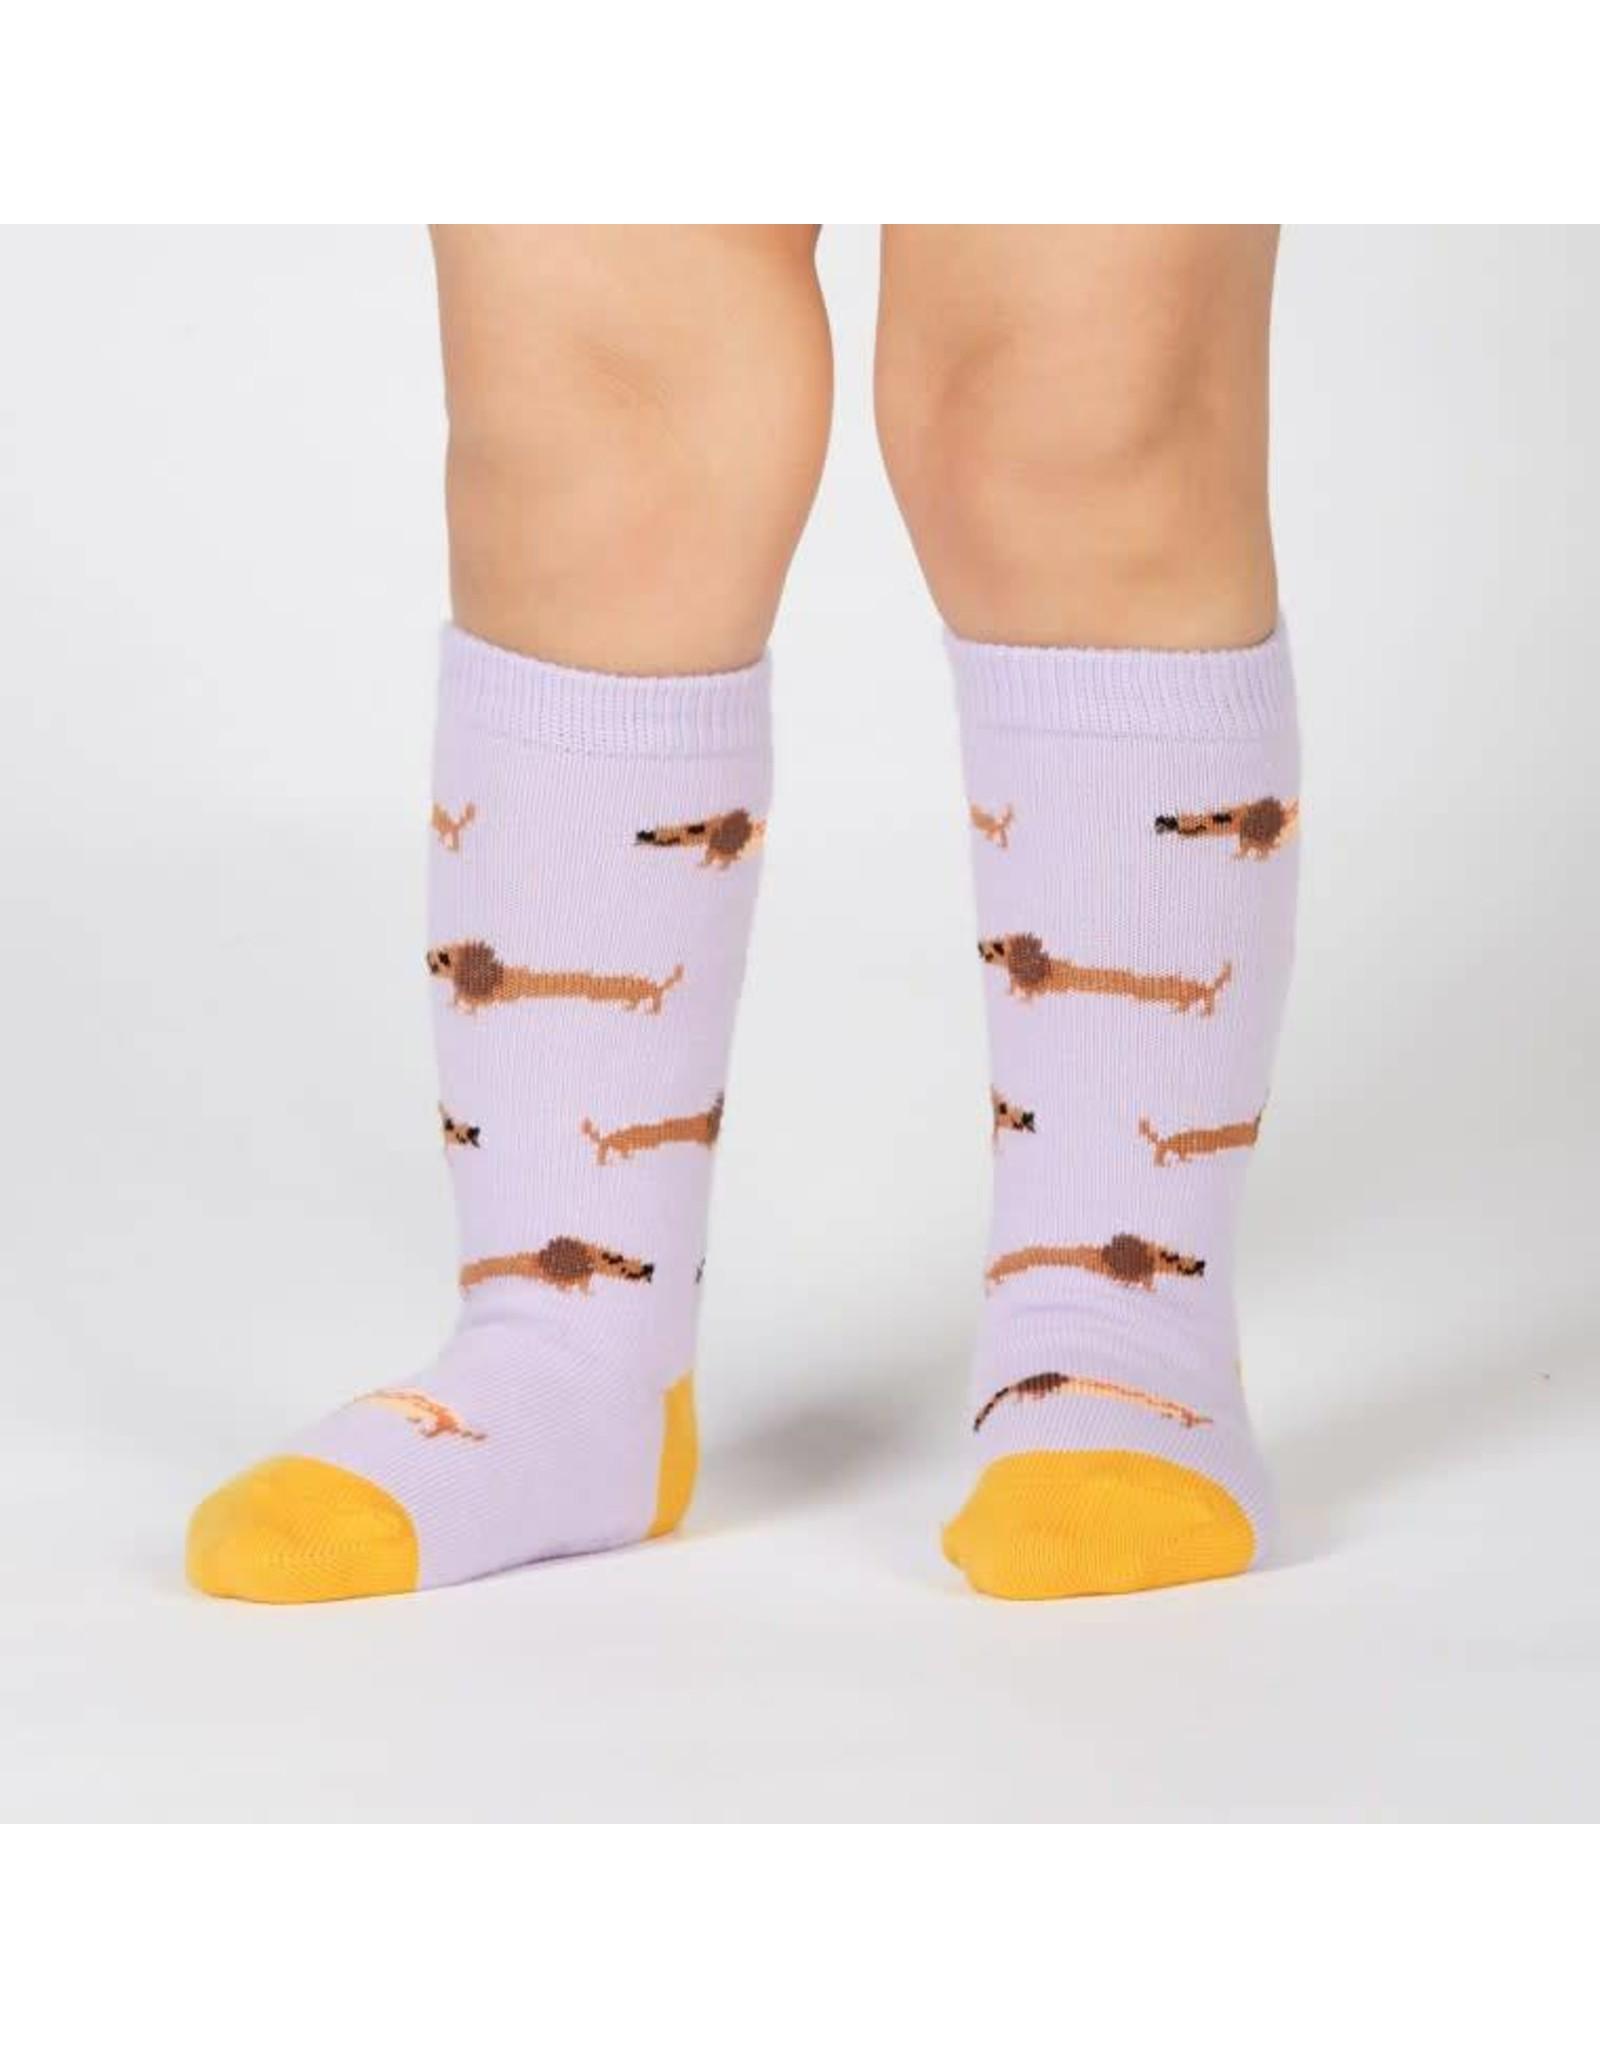 SOCK IT TO ME - Toddler Hot Dogs Knee Socks